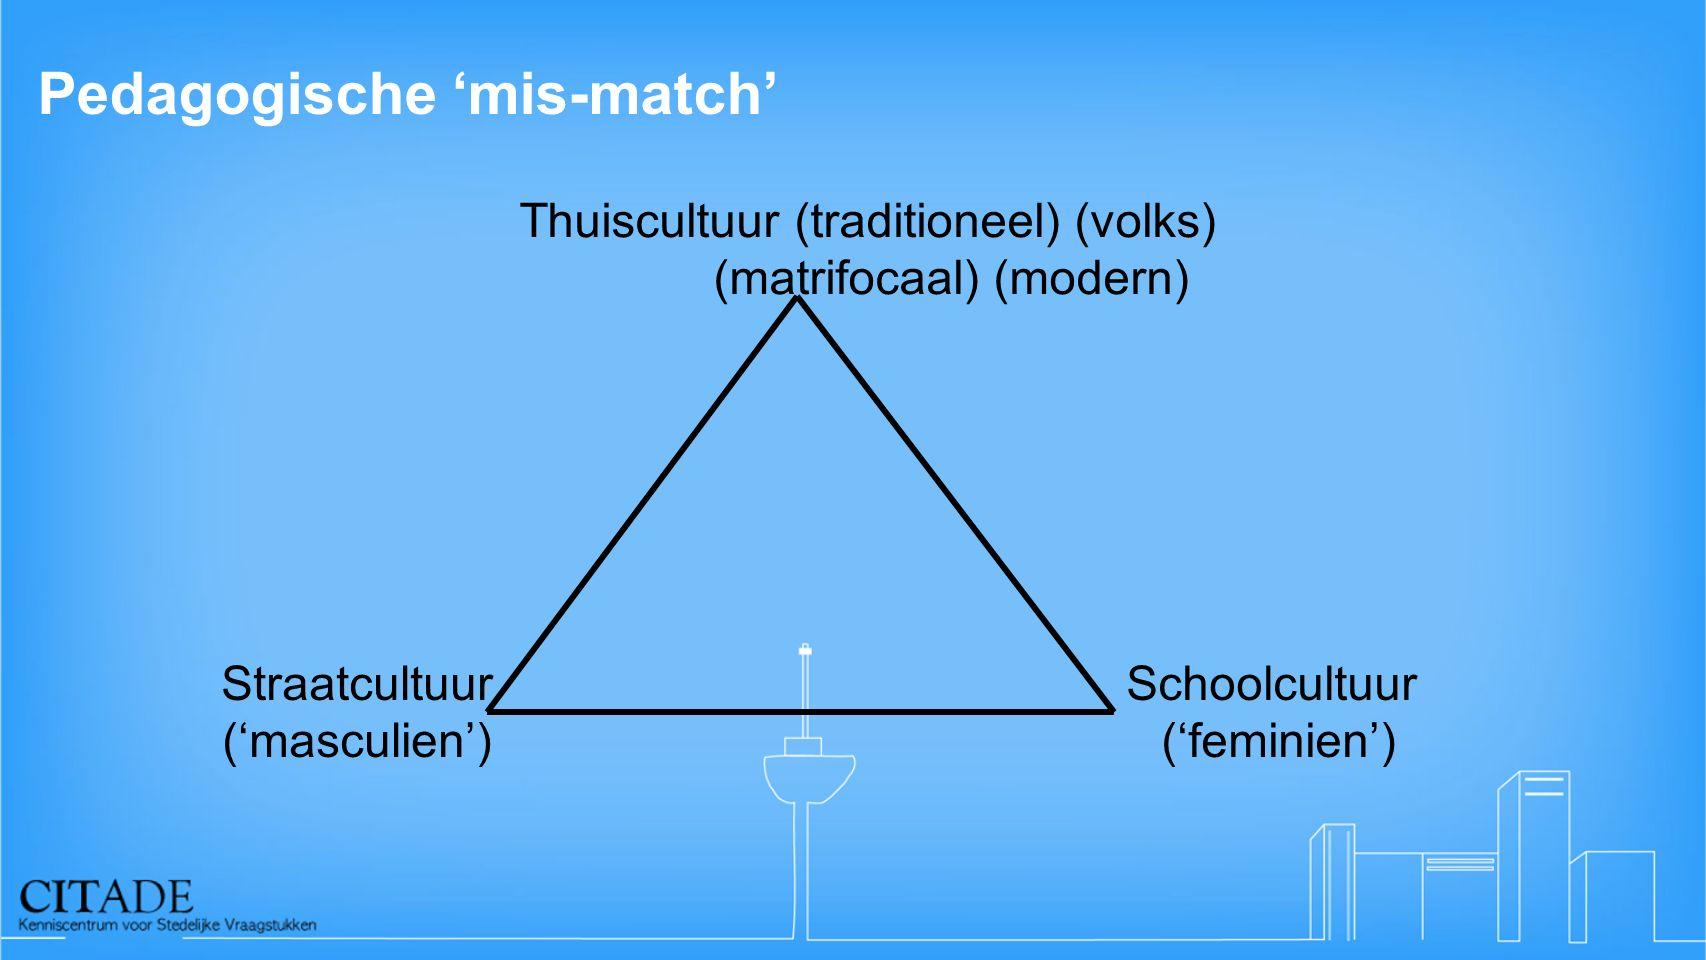 Pedagogische 'mis-match'